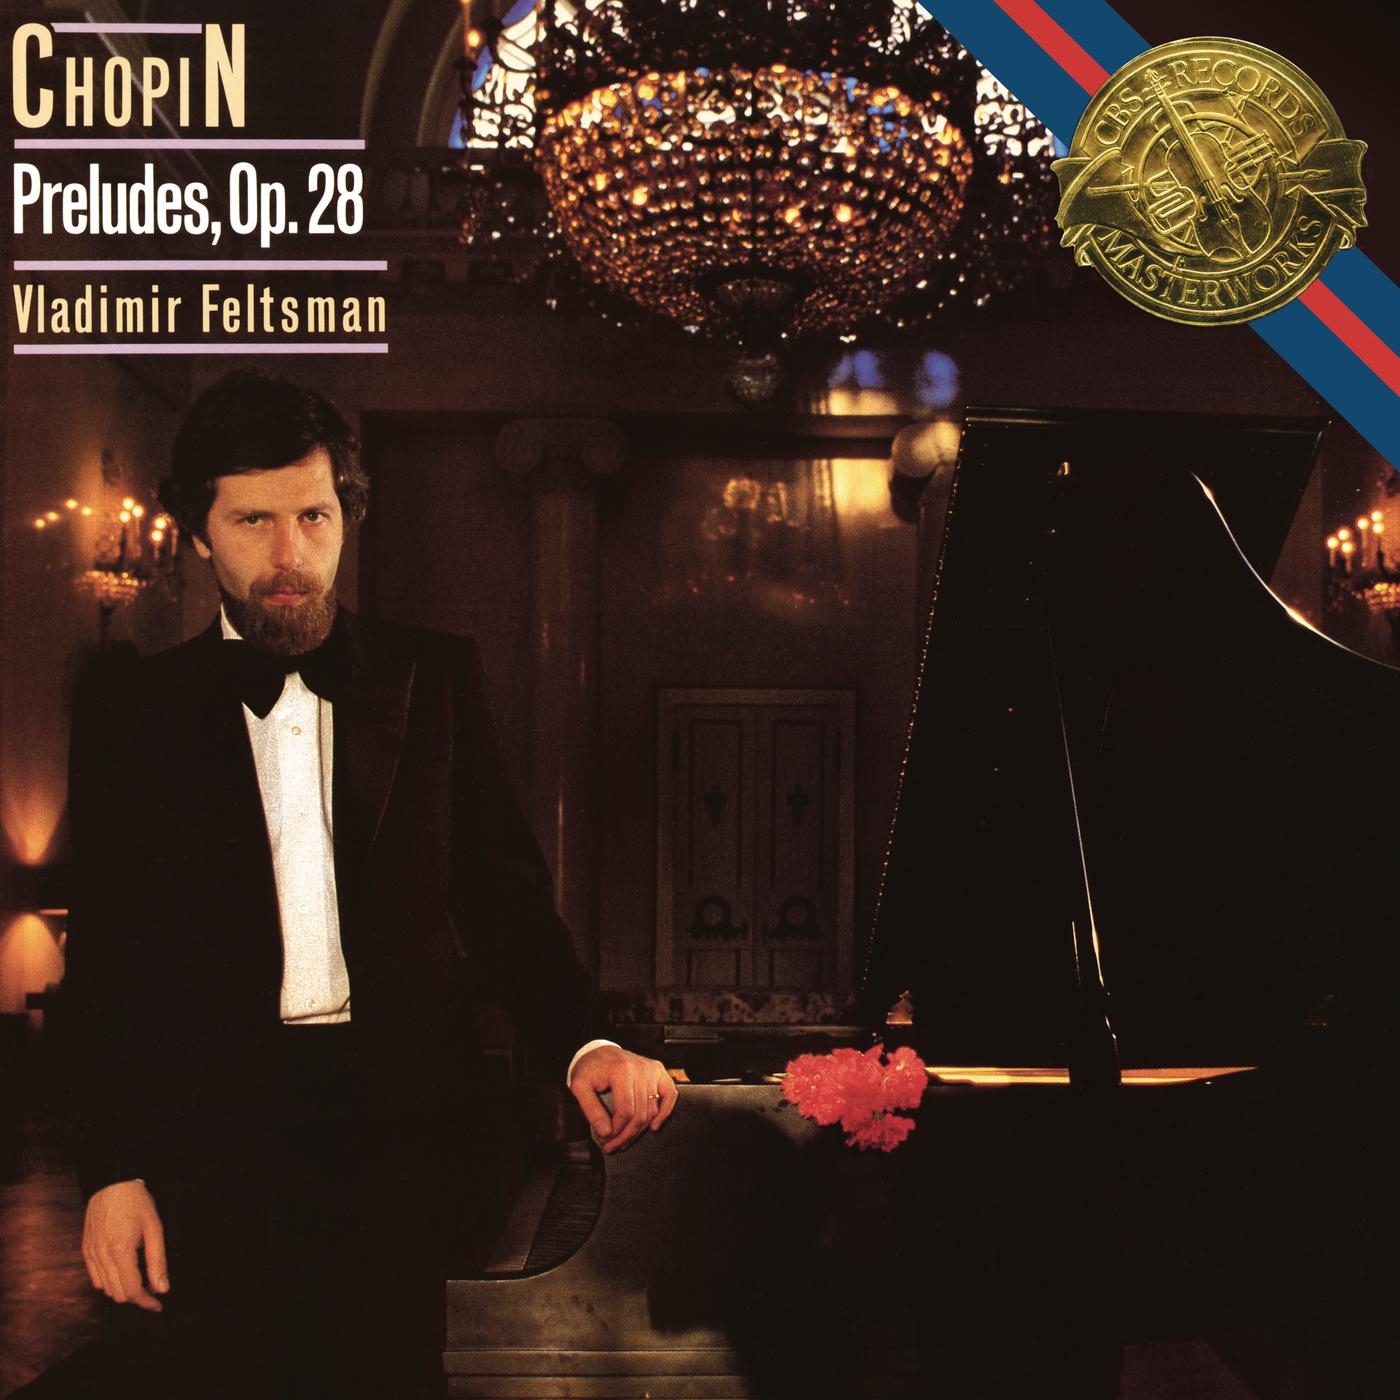 Chopin: Preludes, Op. 28 - Vladimir Feltsman